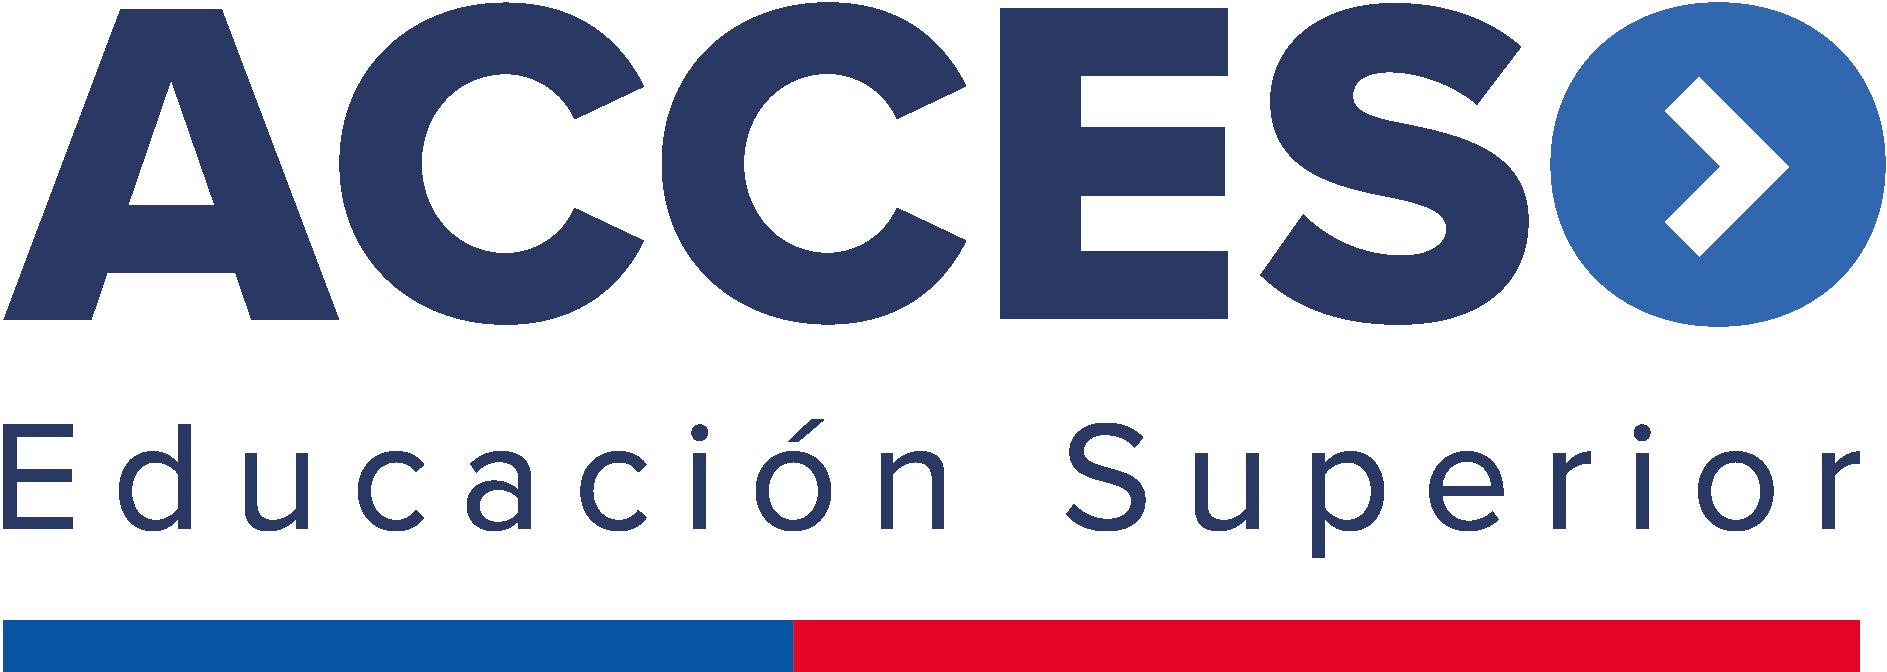 logo-acceso_905x322-150dpi